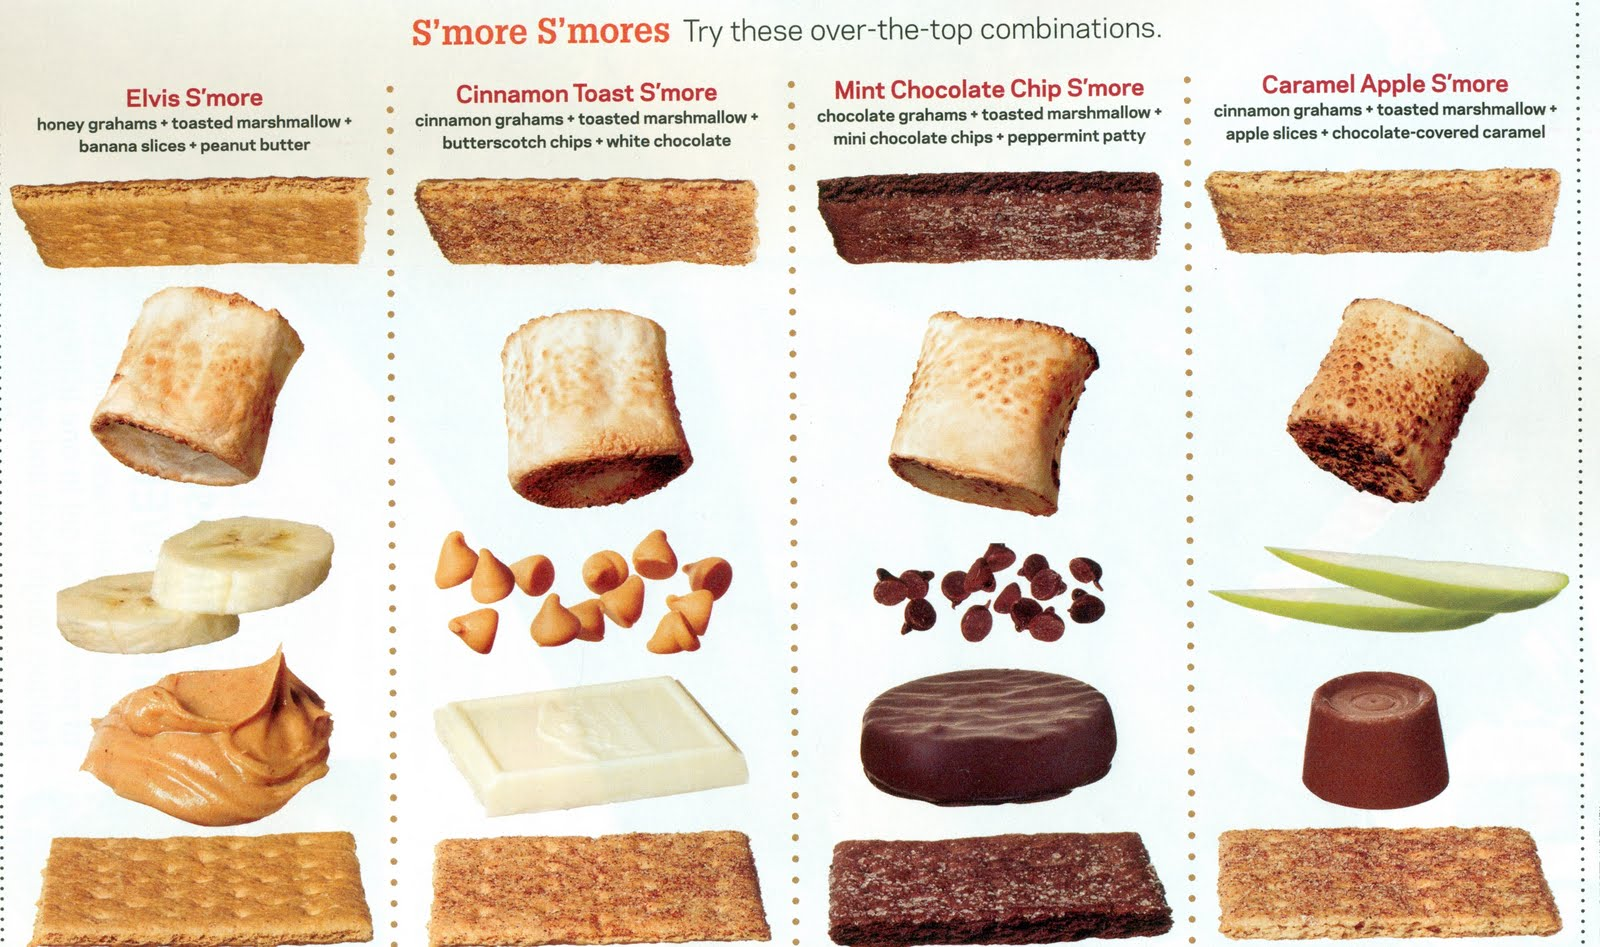 "Elvis S'Mores"": graham cracker, toasted marshmallow, banana slices ..."